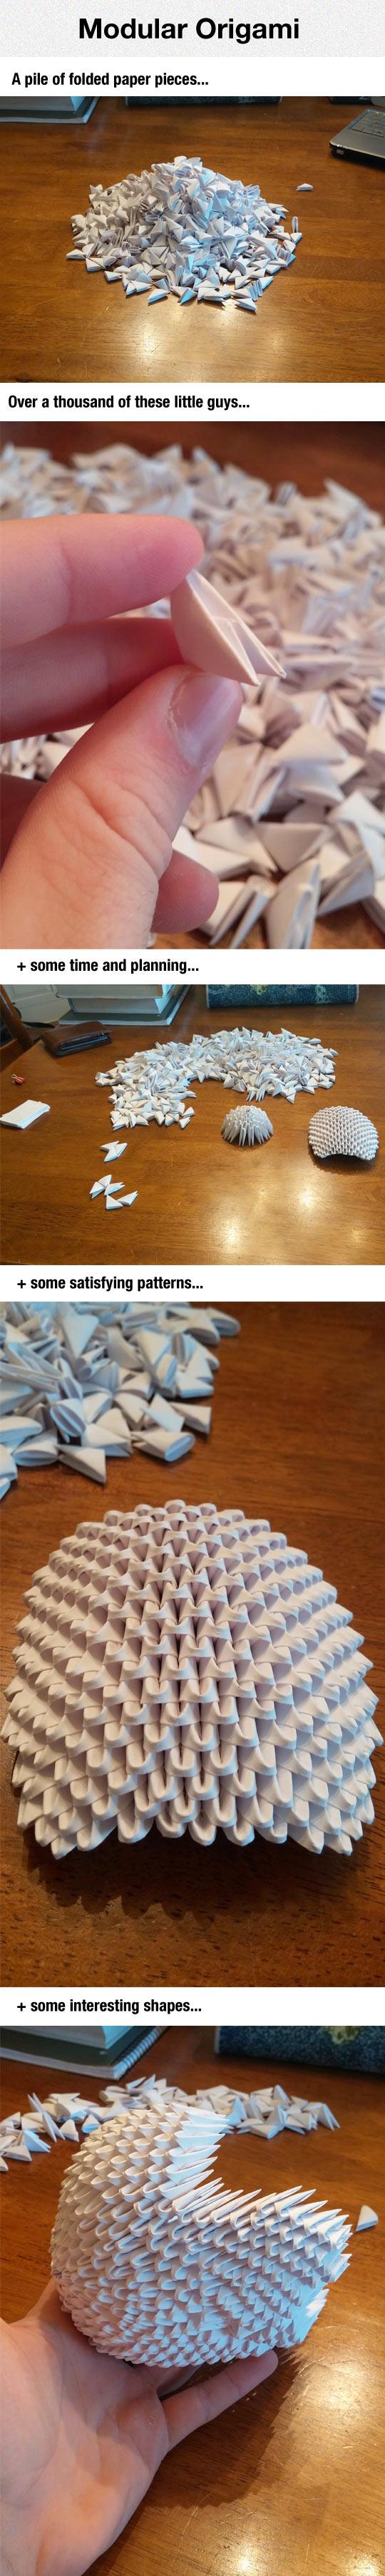 cool-modular-Origami-folded-paper